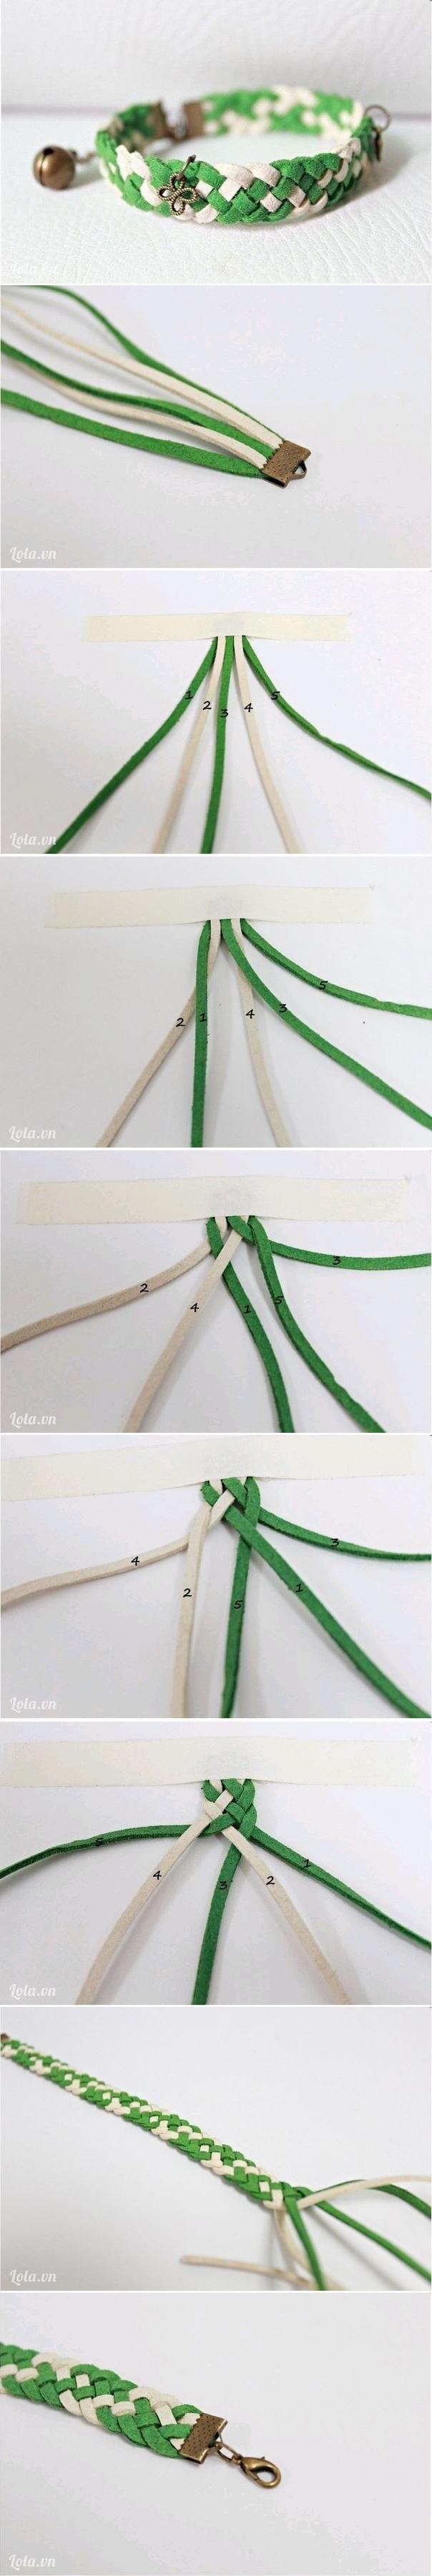 DIY Easy Braided Bracelet   iCreativeIdeas.com LIKE Us on Facebook ==> https://www.facebook.com/icreativeideas